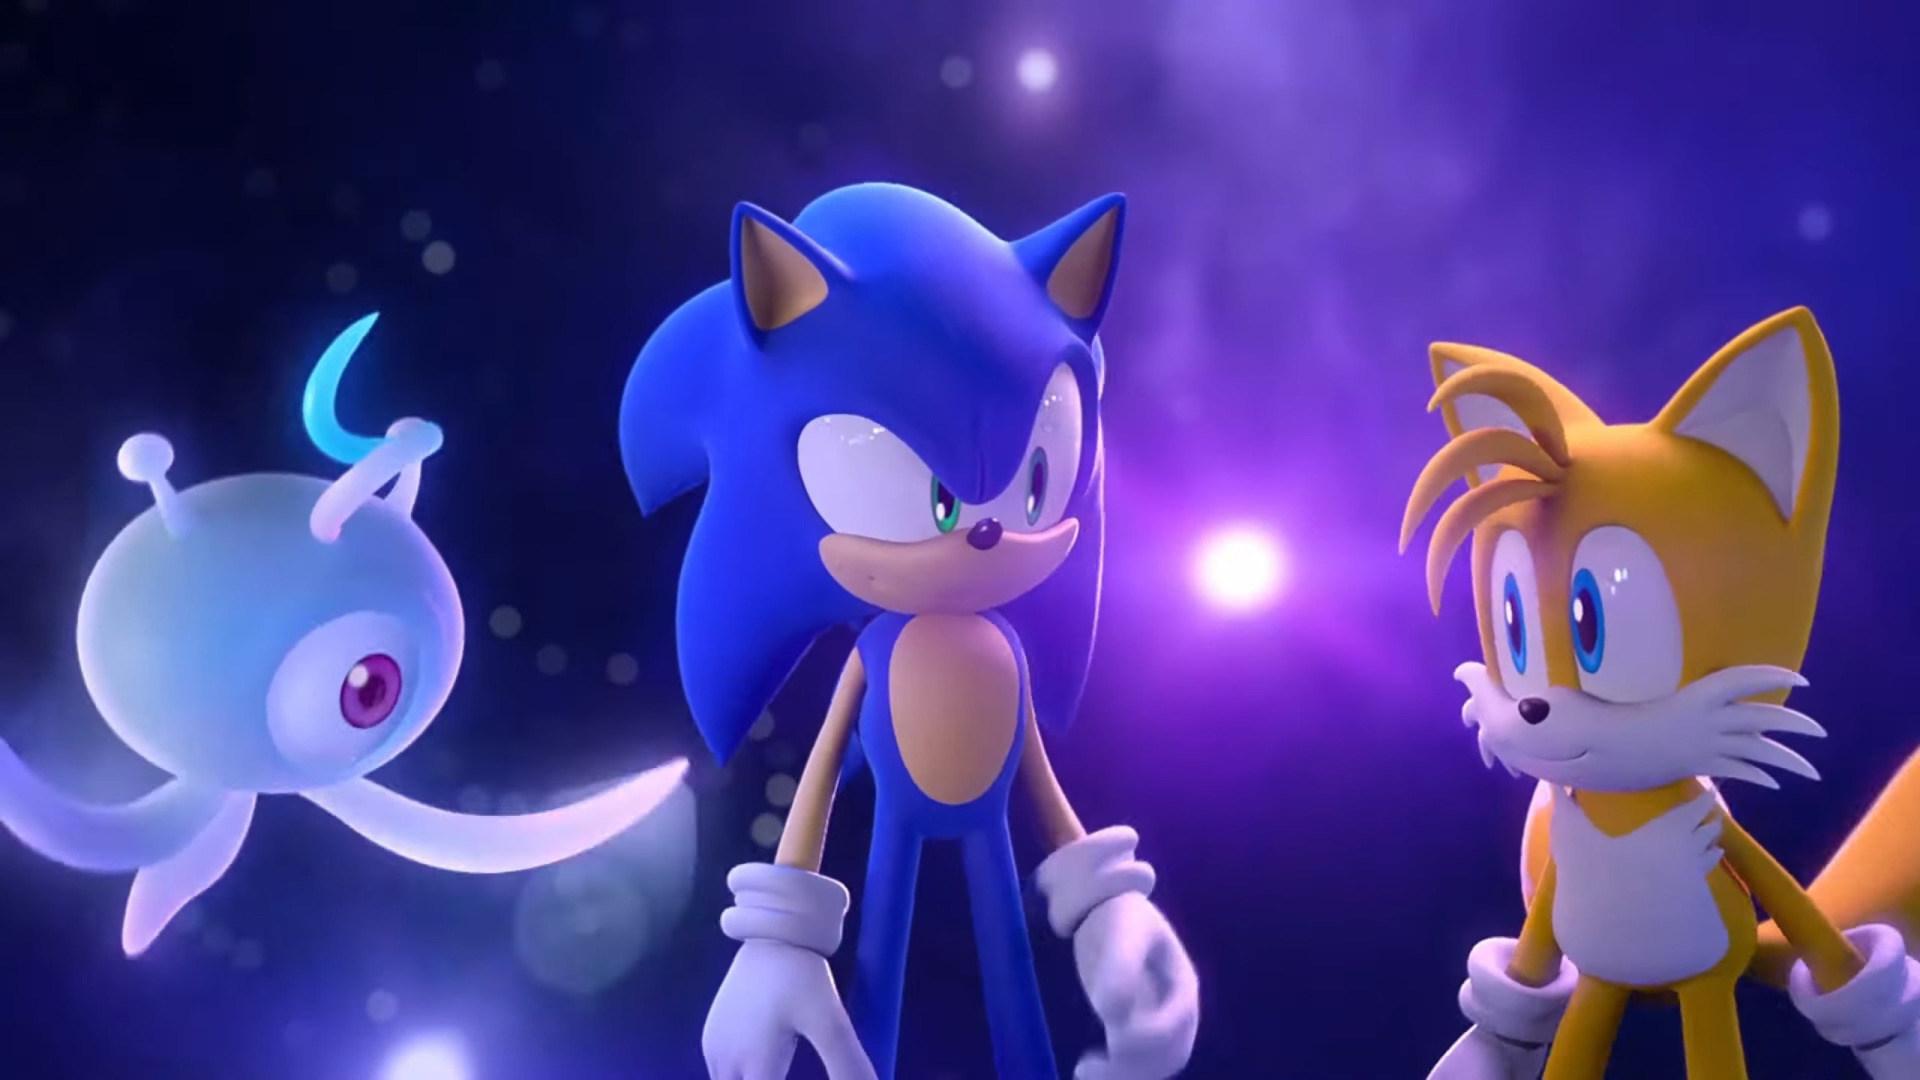 Trailer, SEGA, Jump & Run, Sonic, Remaster, Igel, Sonic Colours, Sonic Colors Ultimate, Sonic Colours Ultimate, Sonic Colors